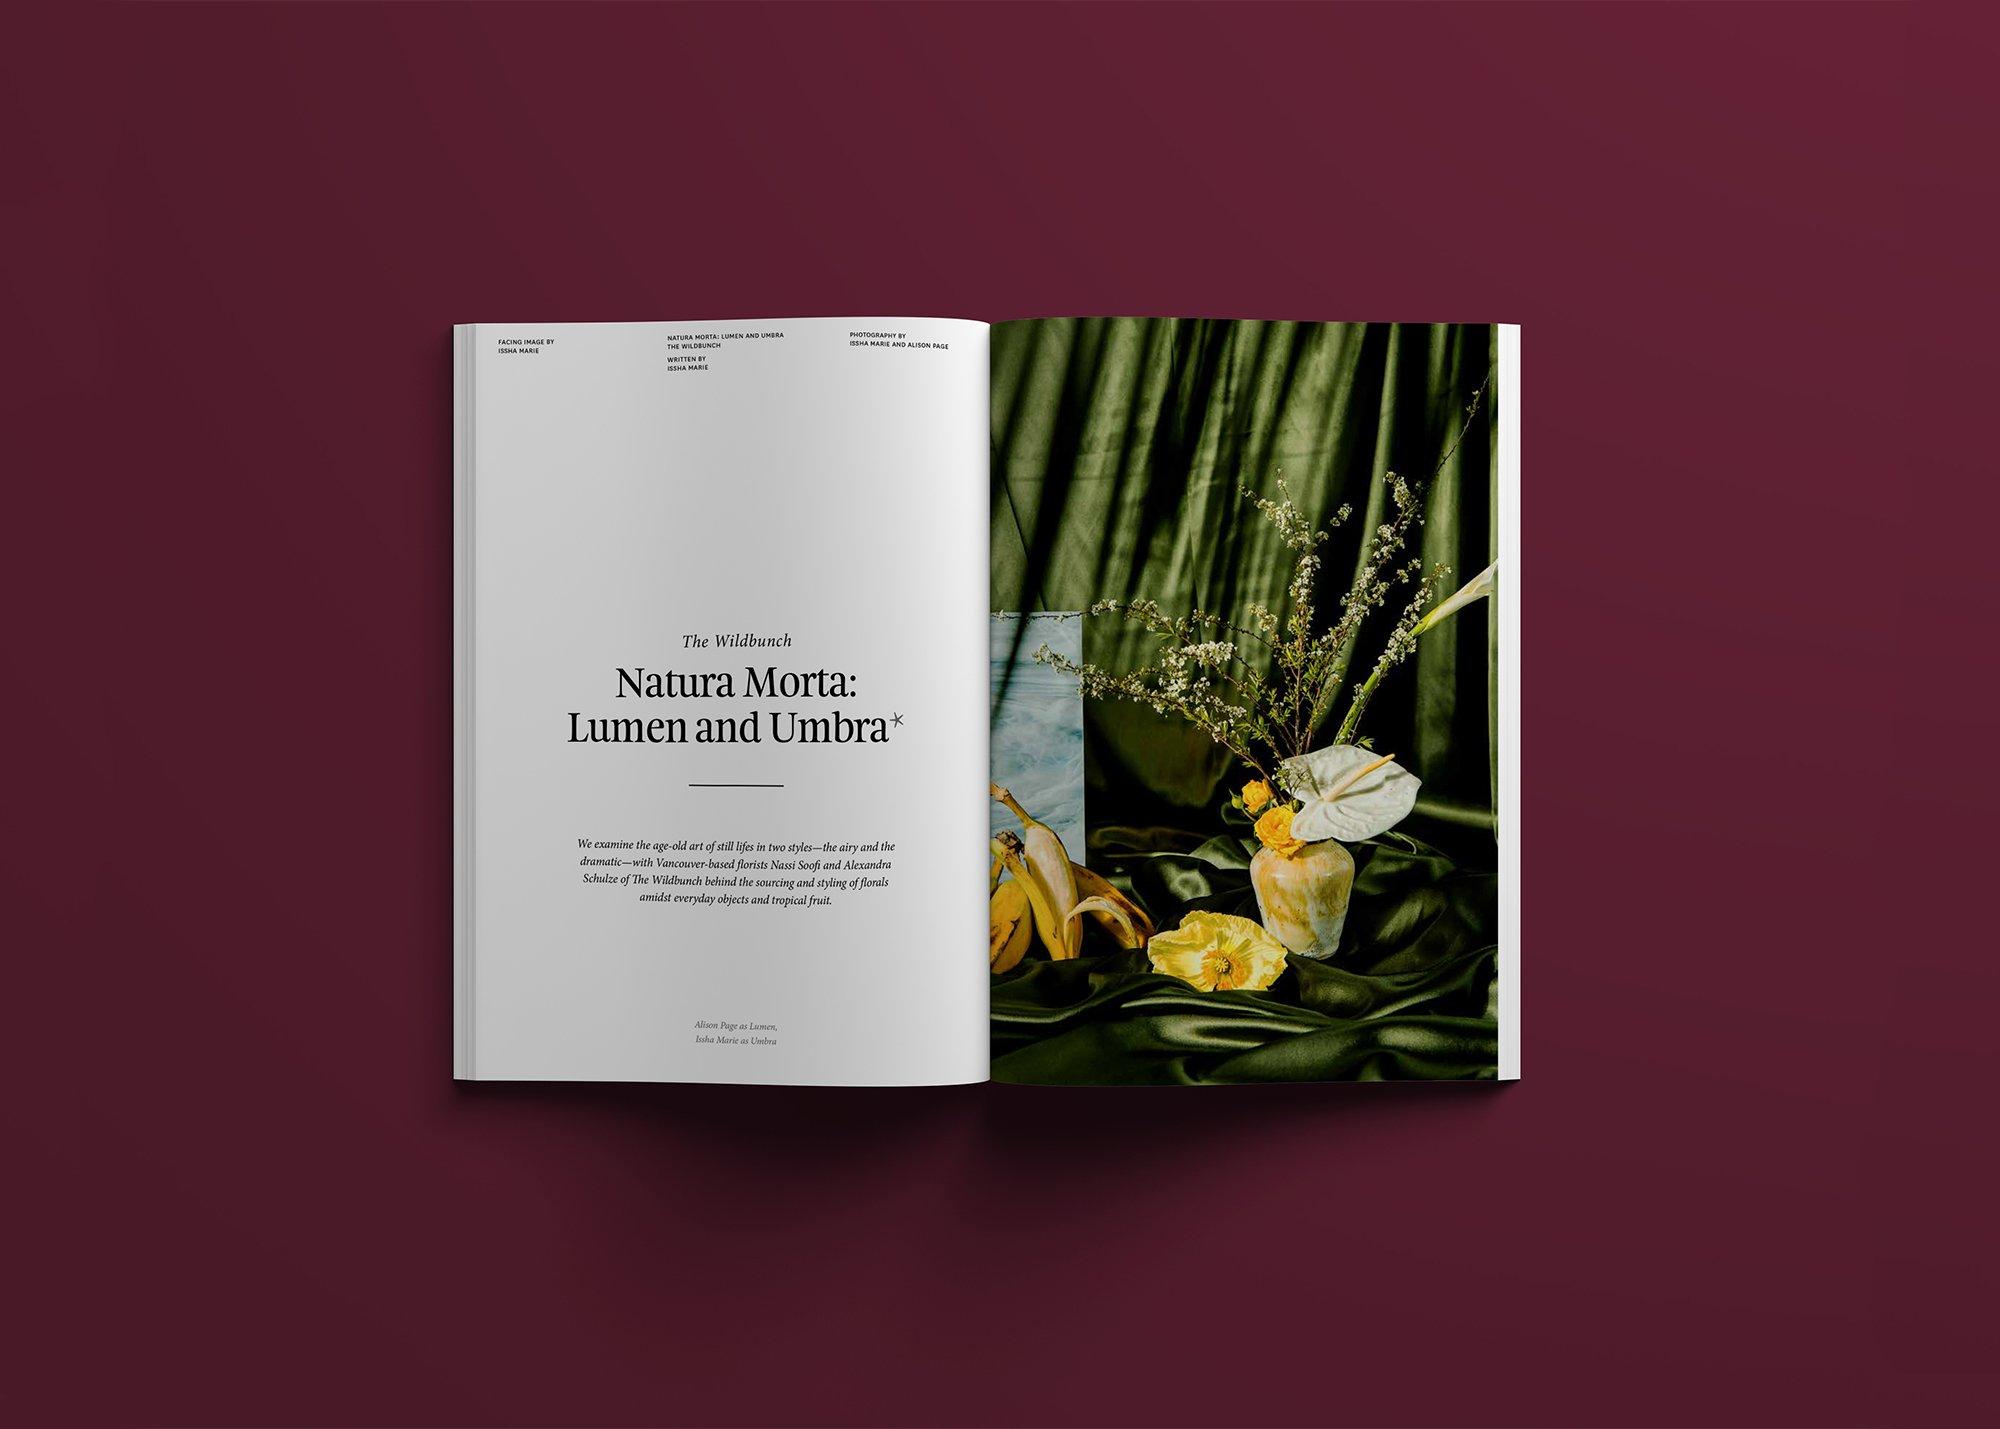 Editorial Design - Colour Designed by Monograph&Co.